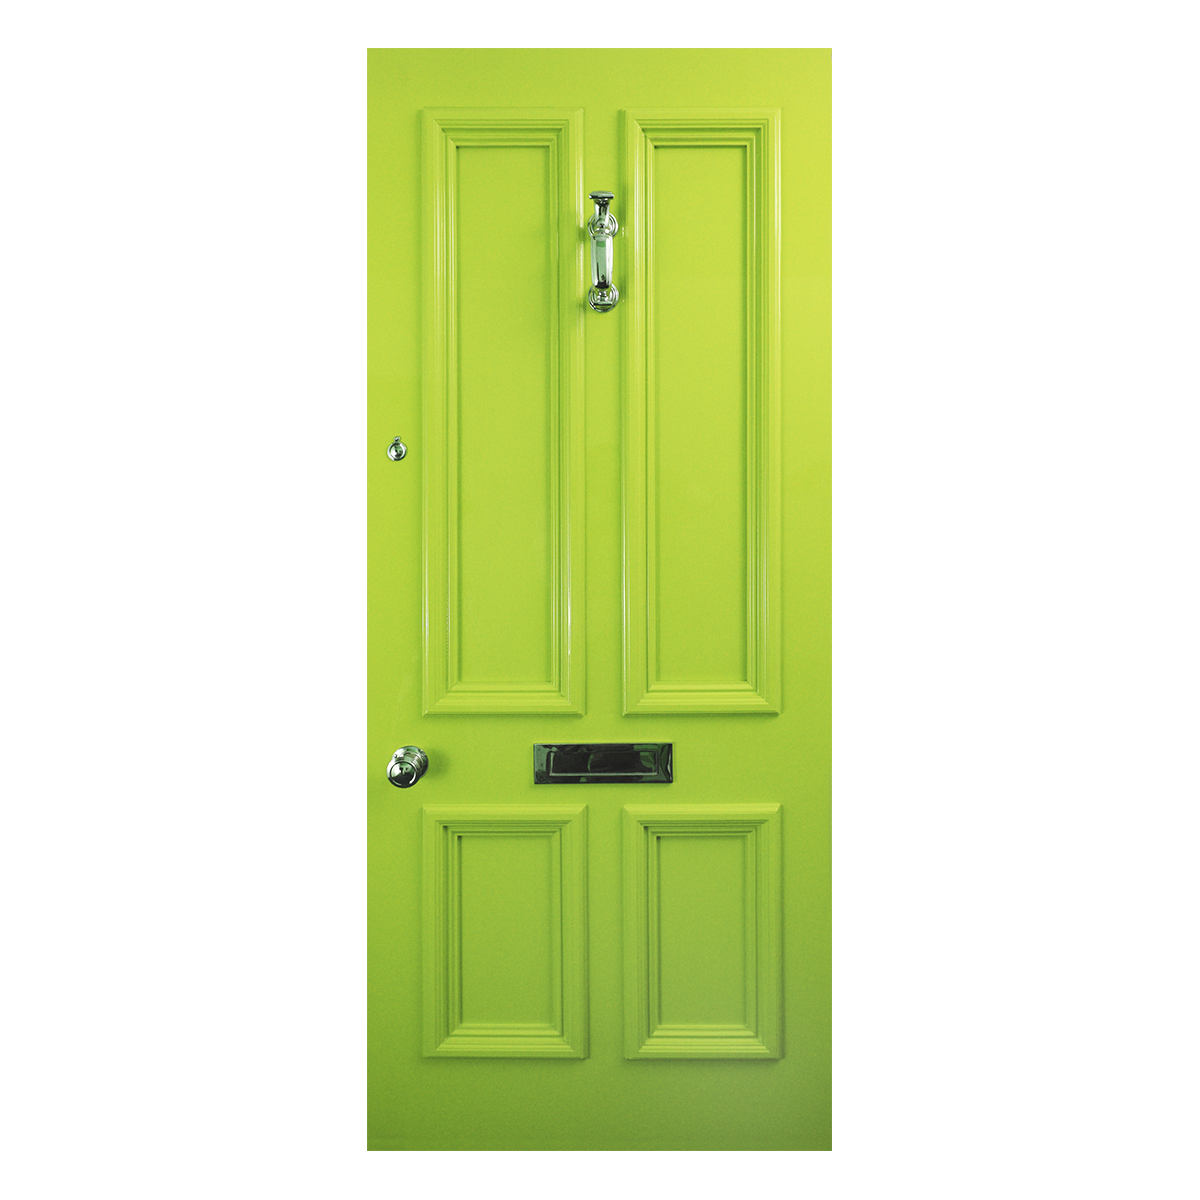 Bespoke Traditional Hardwood Four Panel Door Period Home